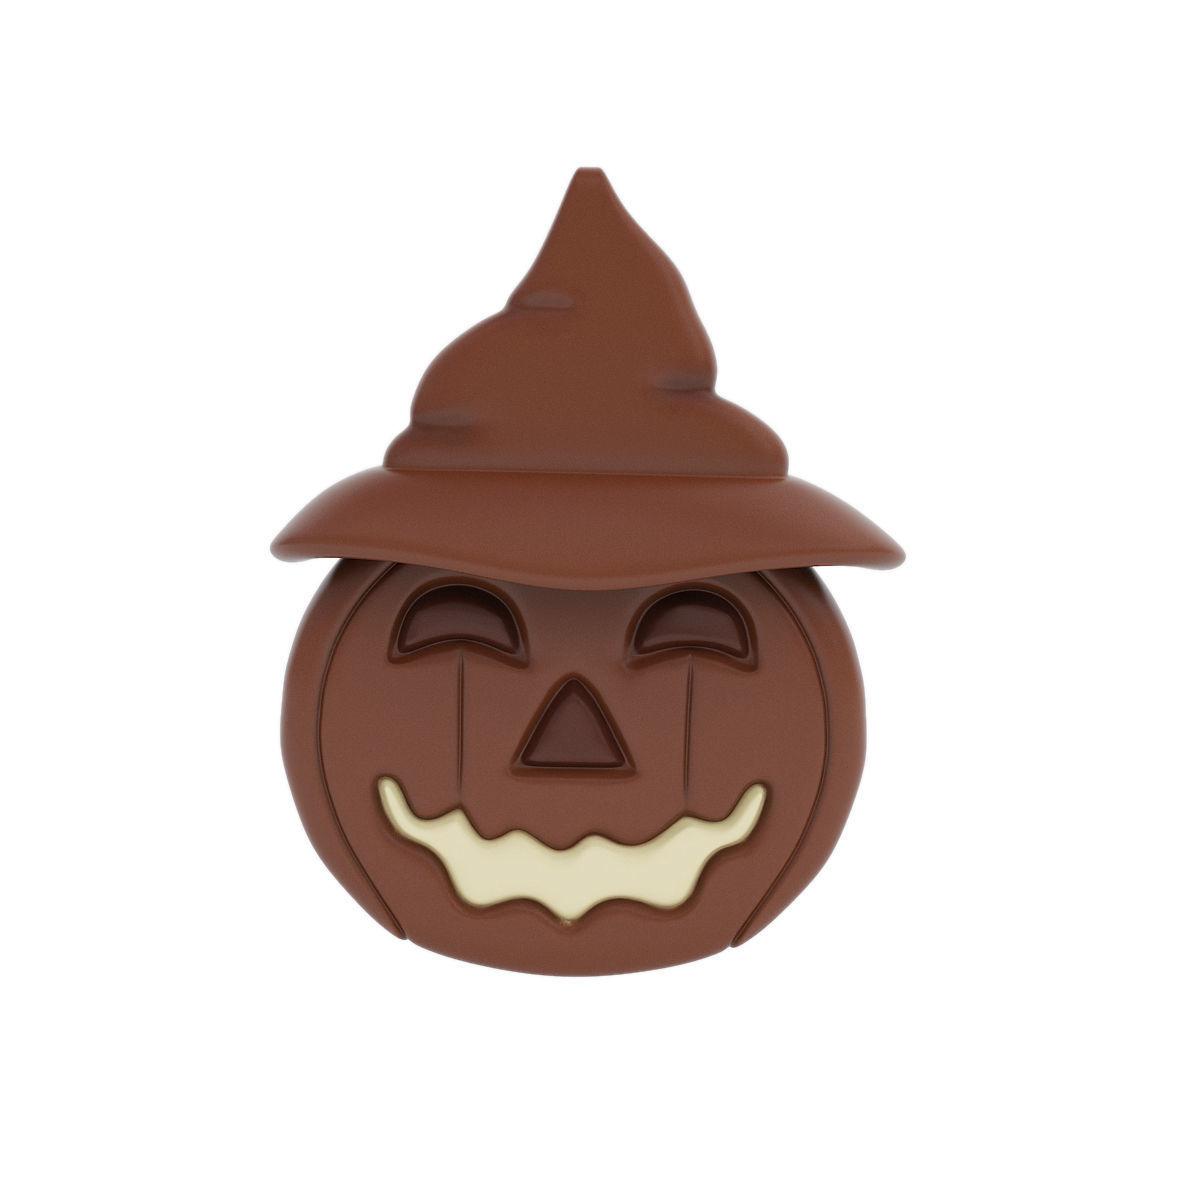 Halloween chocolate figurine with hat